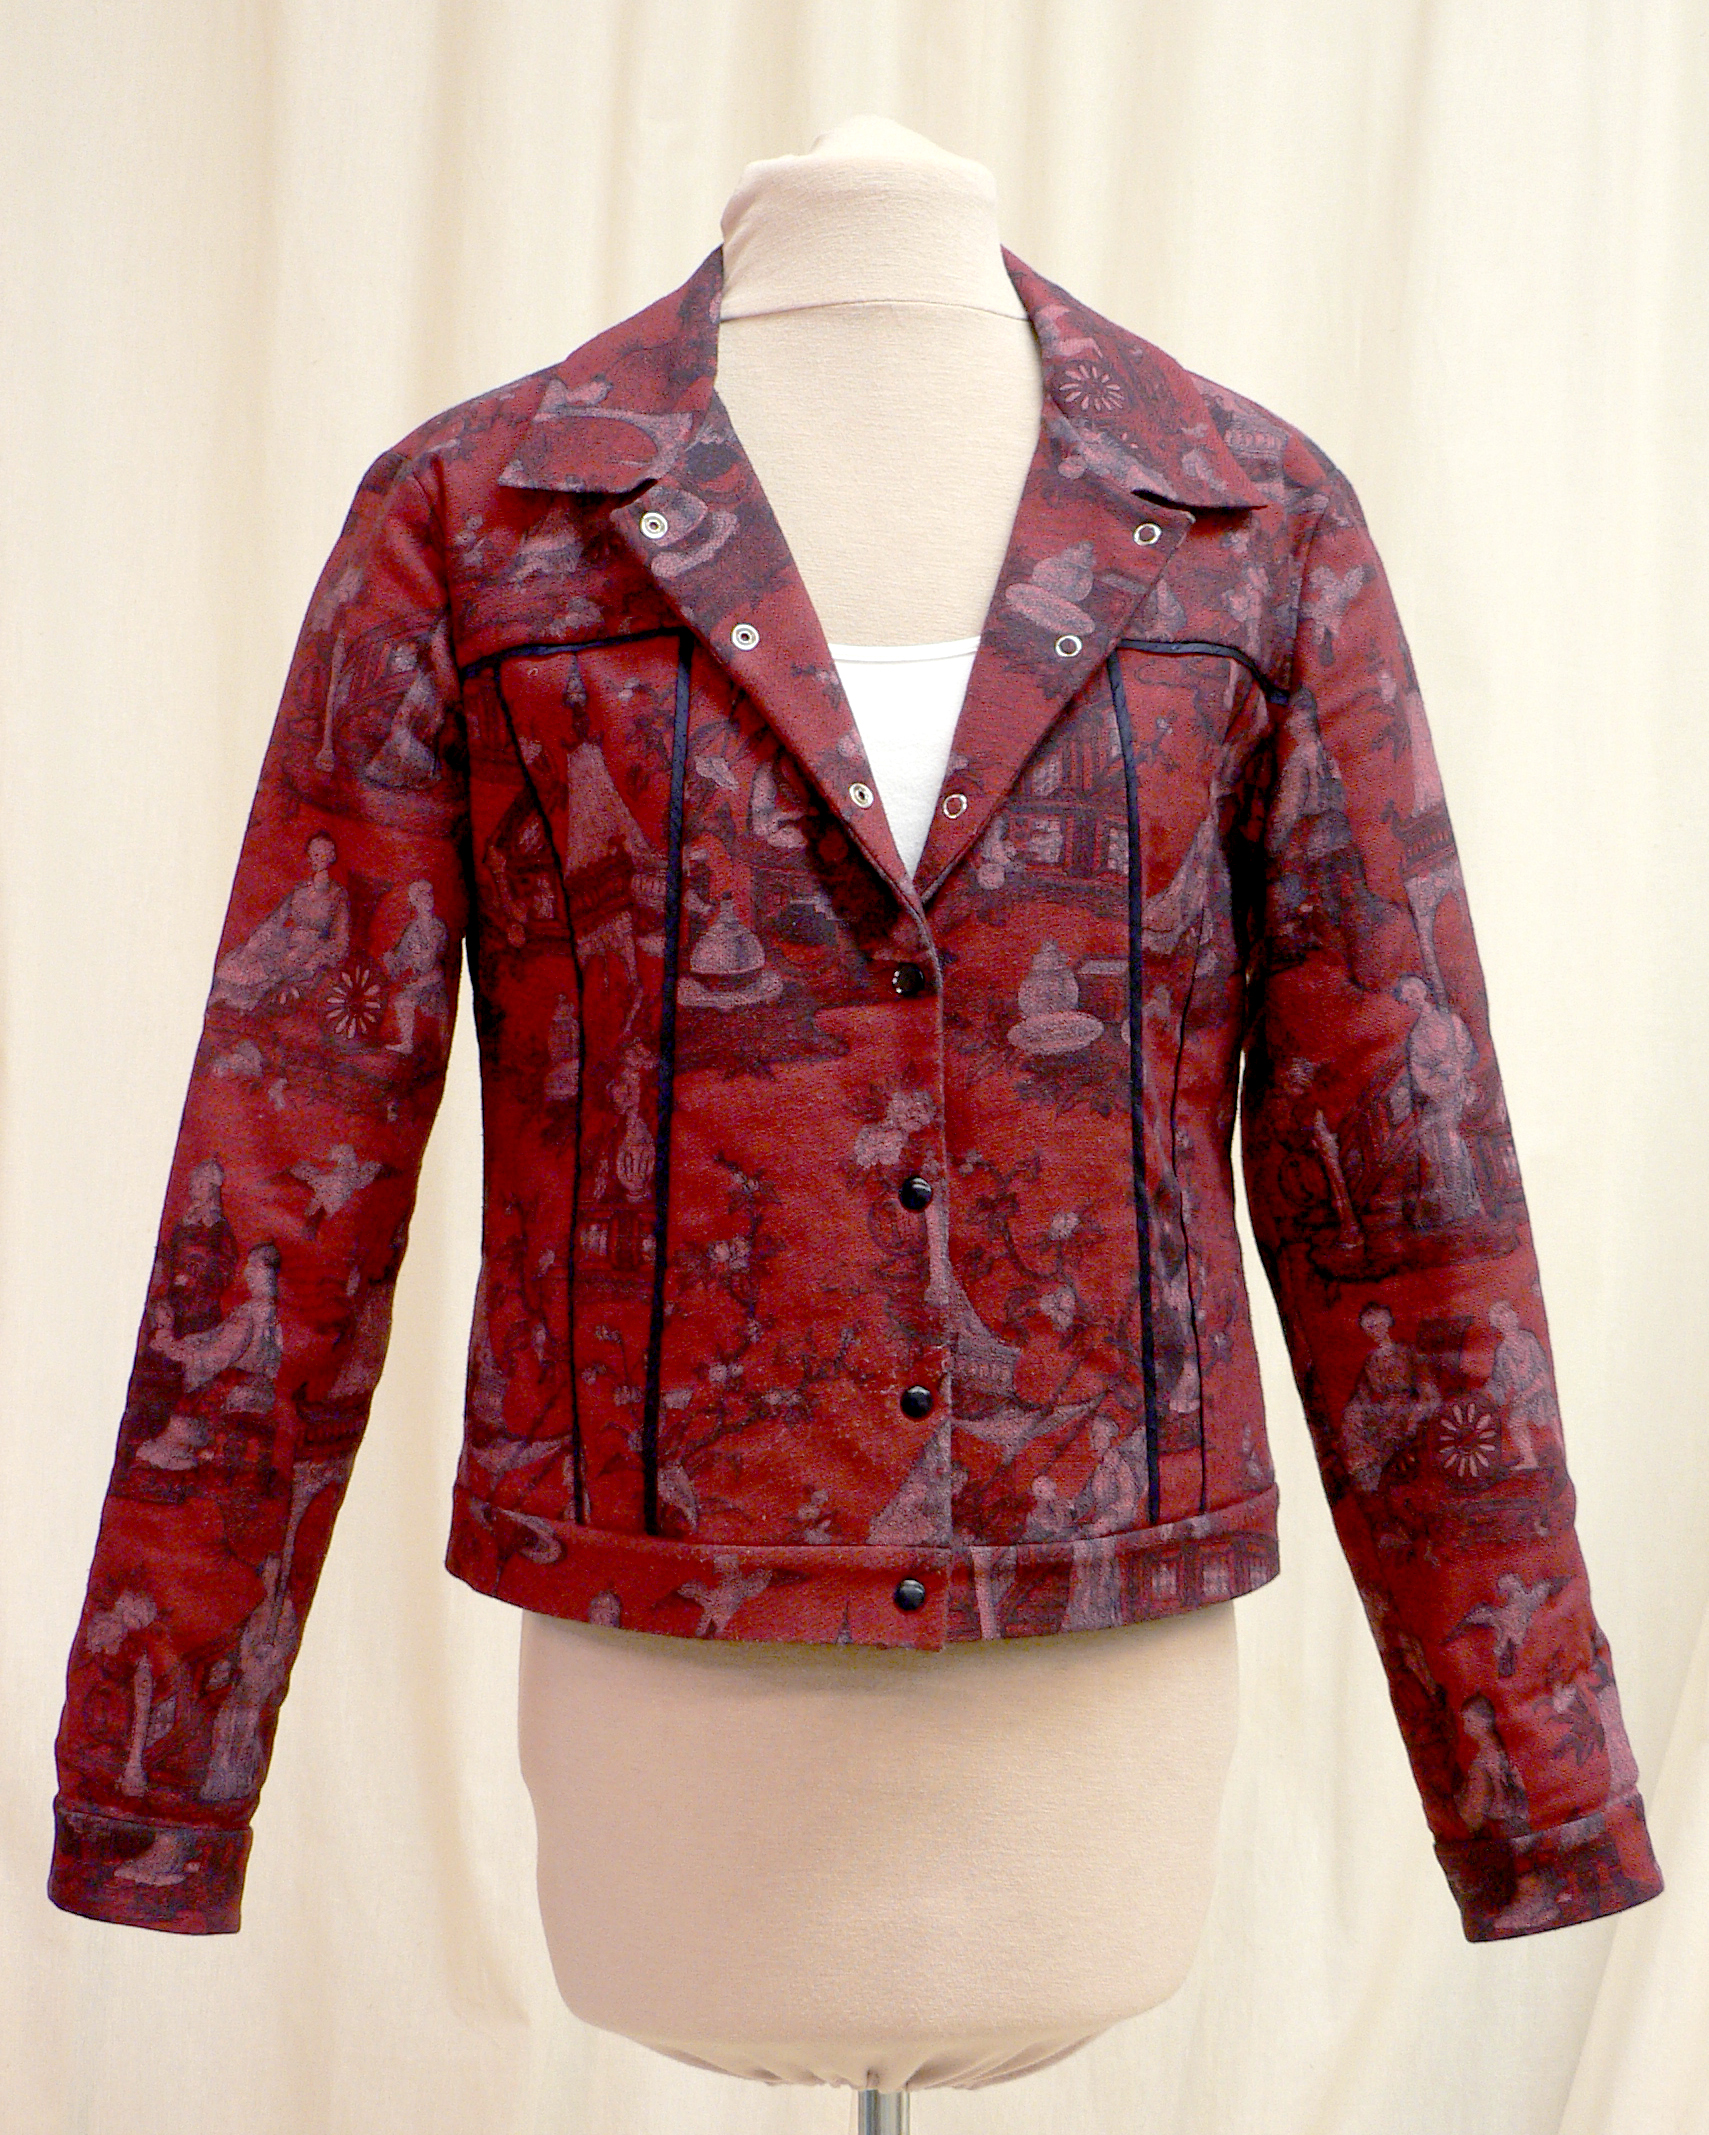 jacket03_front.jpg